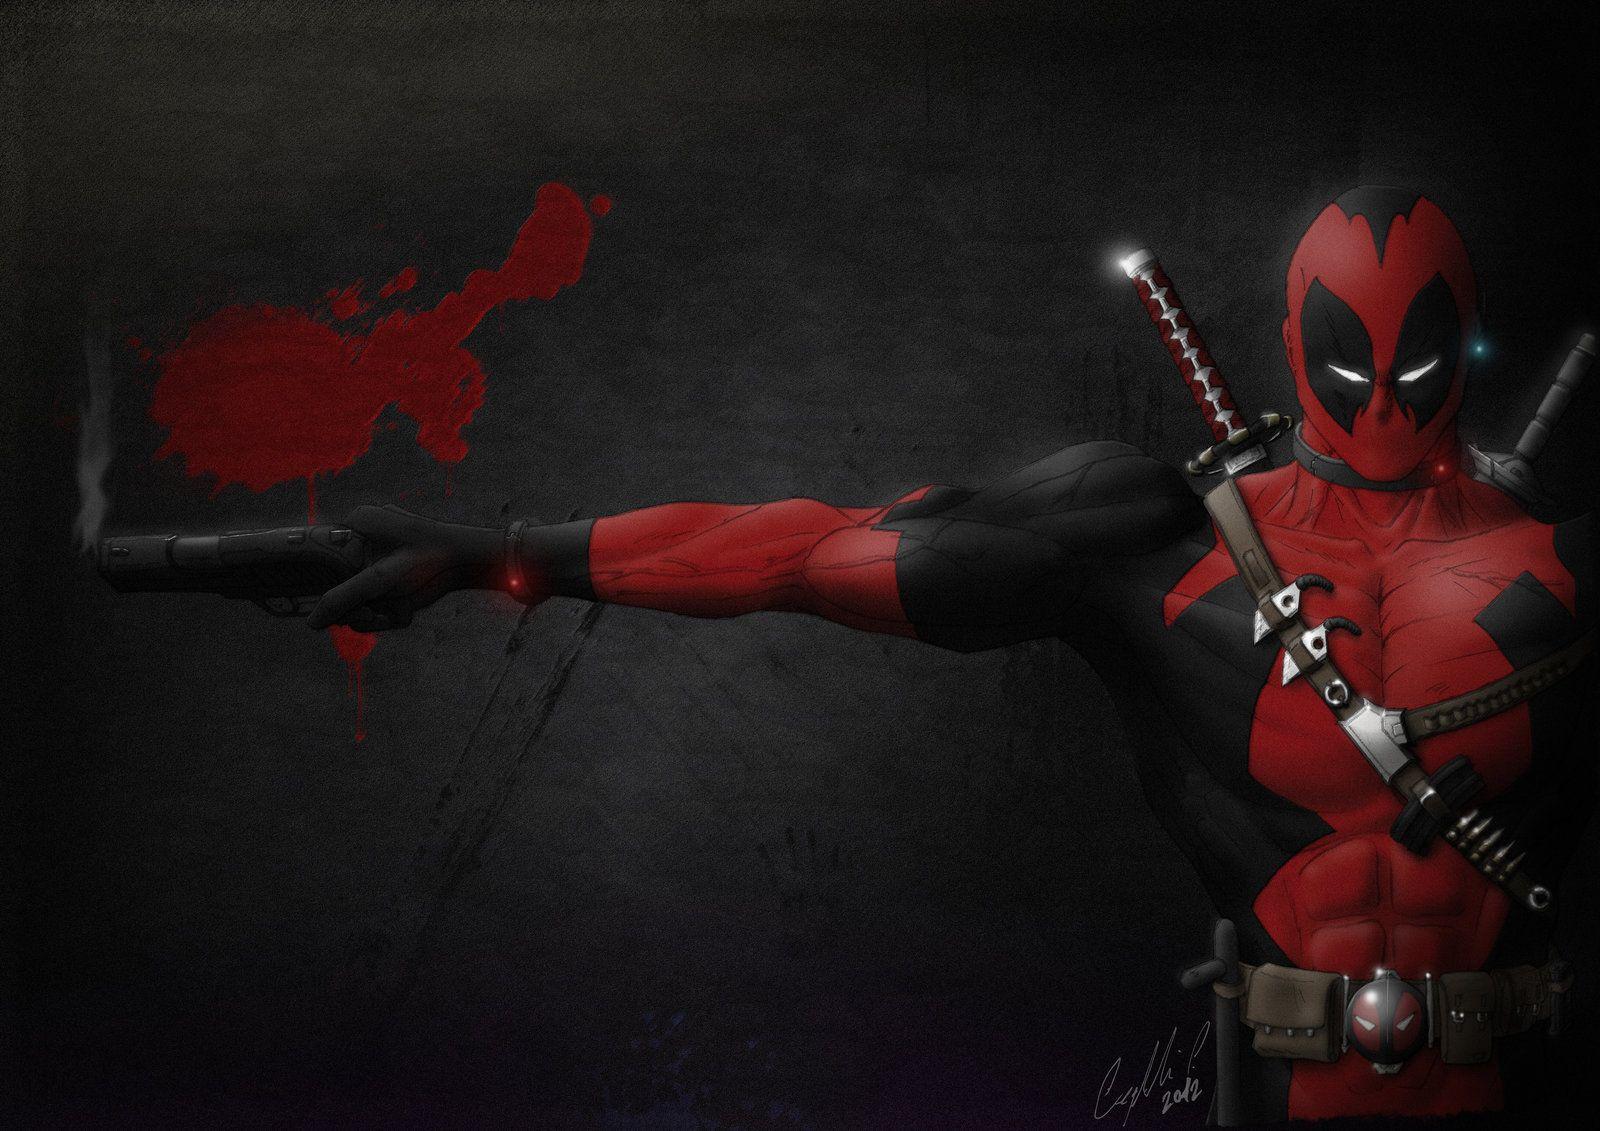 1000 Ideas About Deadpool Hd Wallpaper On Pinterest: Deadpool Cool Fan Art Wallpaper HD. Free Desktop